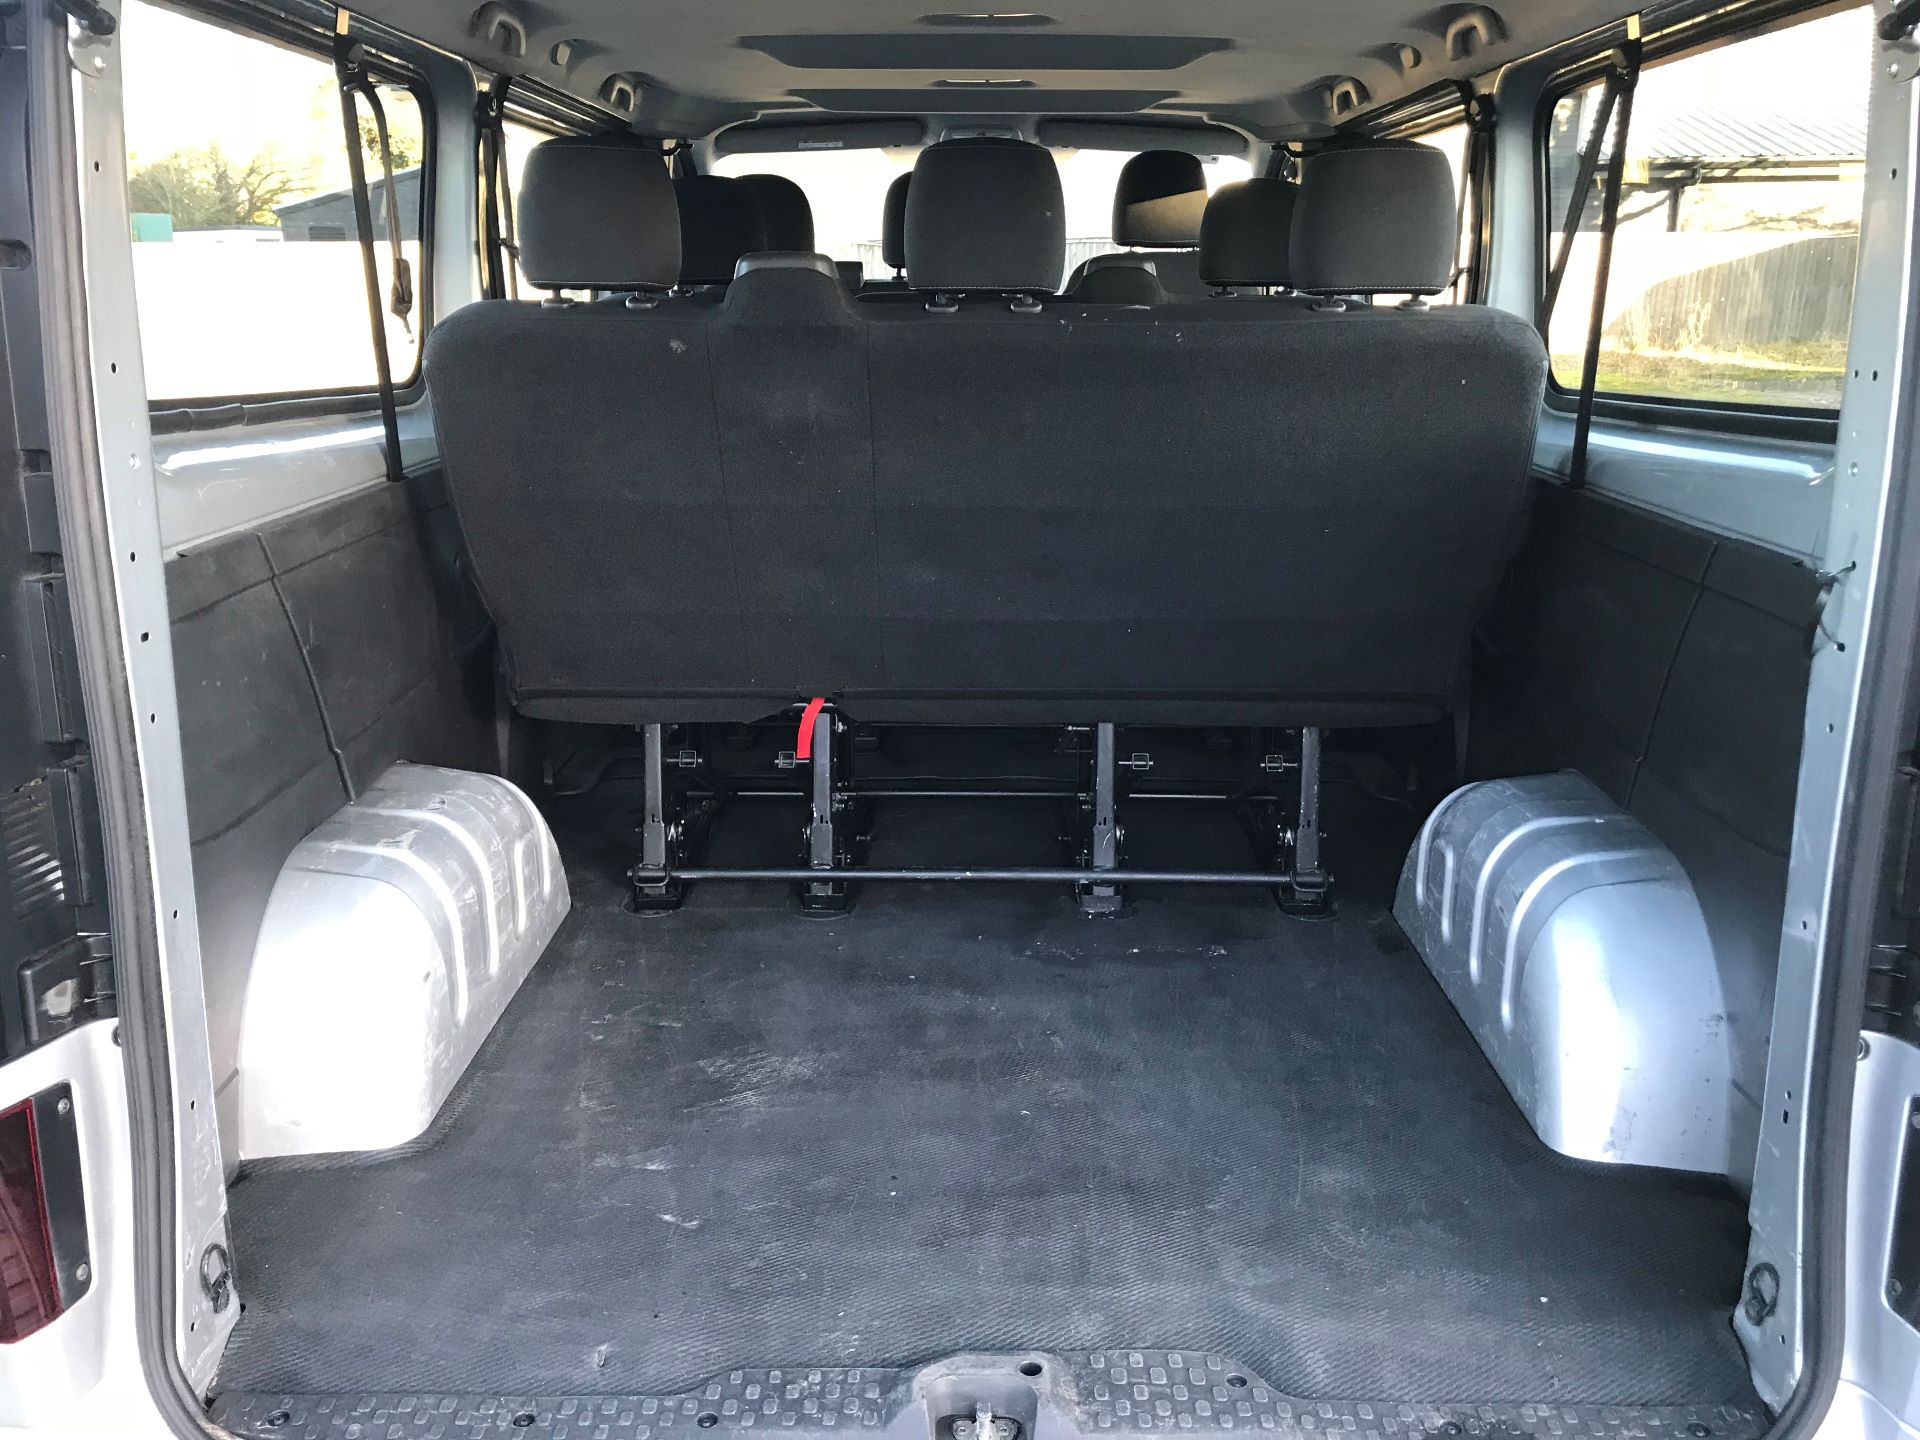 2017 Vauxhall Vivaro 2900 1.6Cdti Biturbo 125Ps H1 Combi 9 Seat (DY17UVM) Image 8